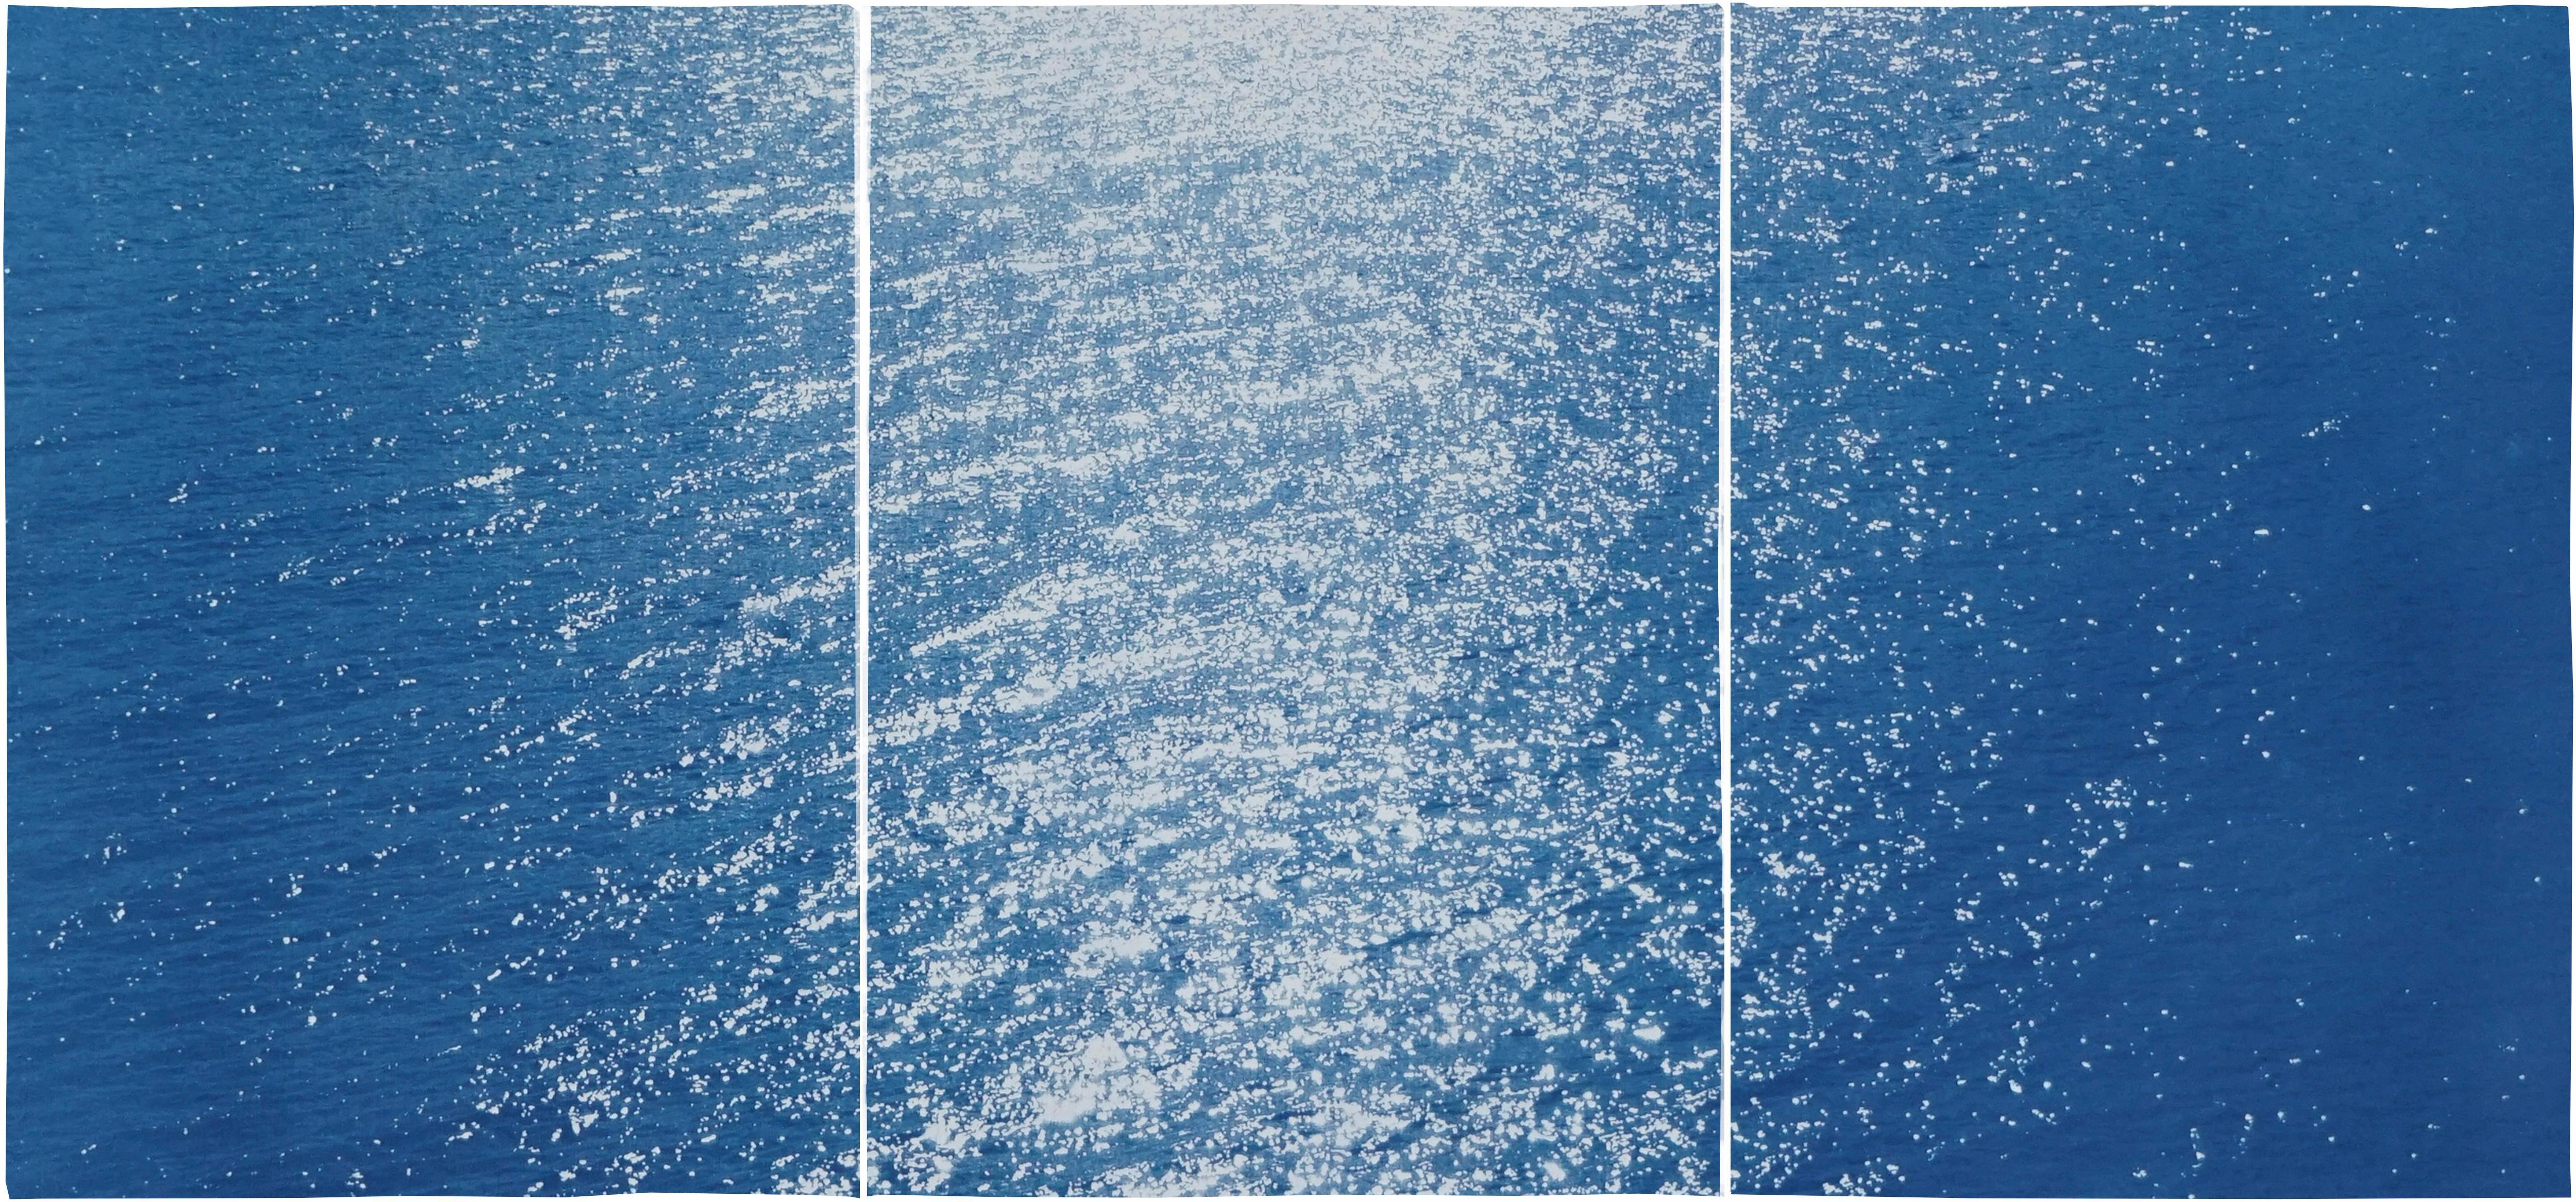 Amalfi Coast Seascape, Nautical Triptych Cyanotype on Paper, Sunrise Bay, Blue